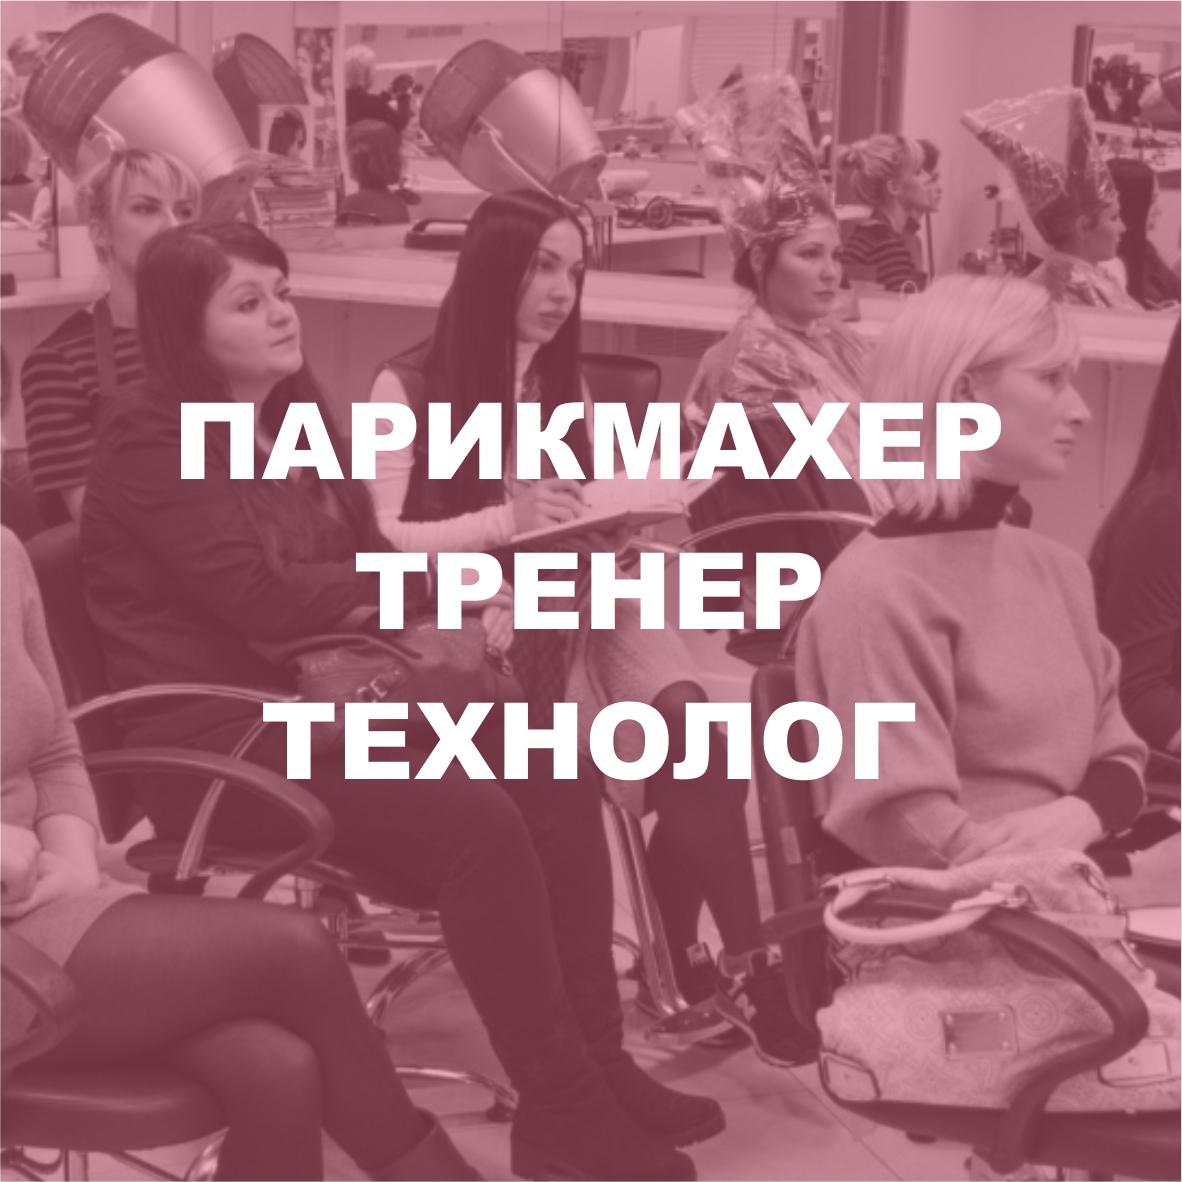 ПАРИКМАХЕР-ТРЕНЕР ТЕХНОЛОГ